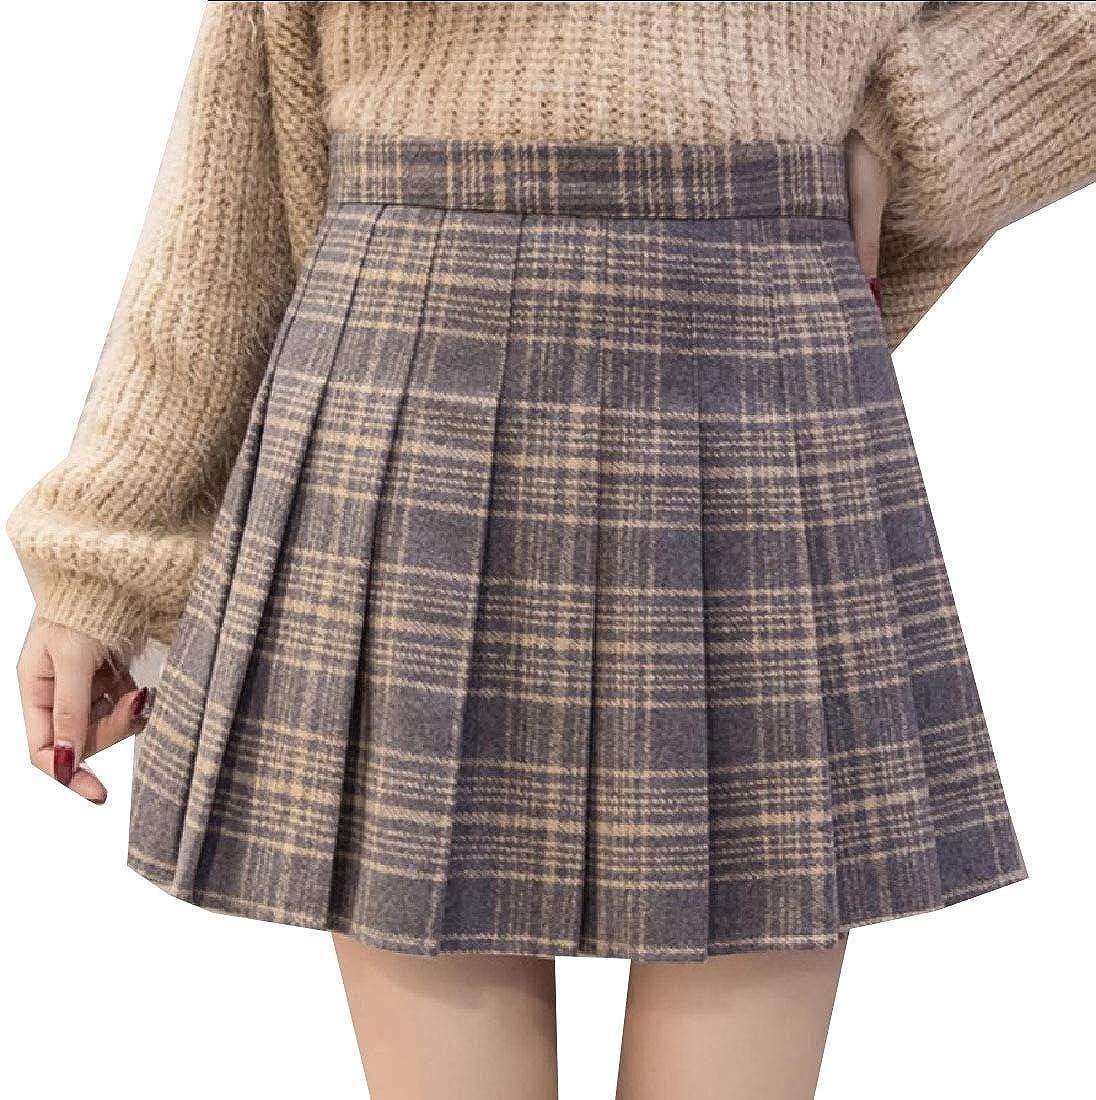 Doufine Women Uniform Mini Party Glen Plaid Stylish School Skirt